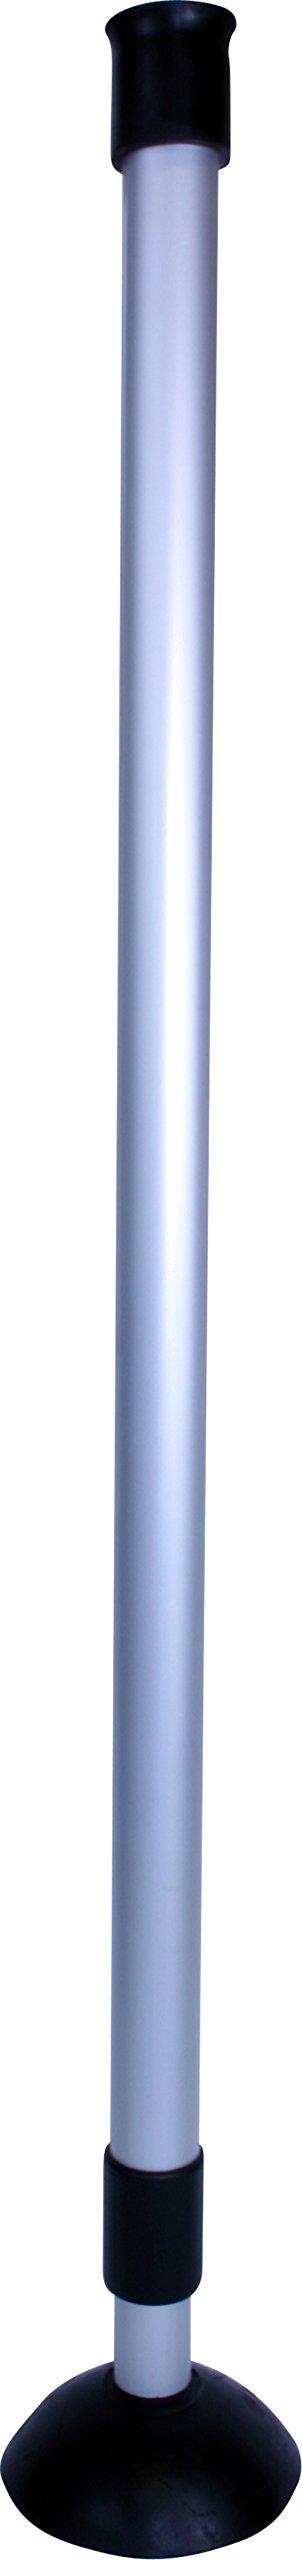 SeaSense Telescoping Boat Cover Support Pole